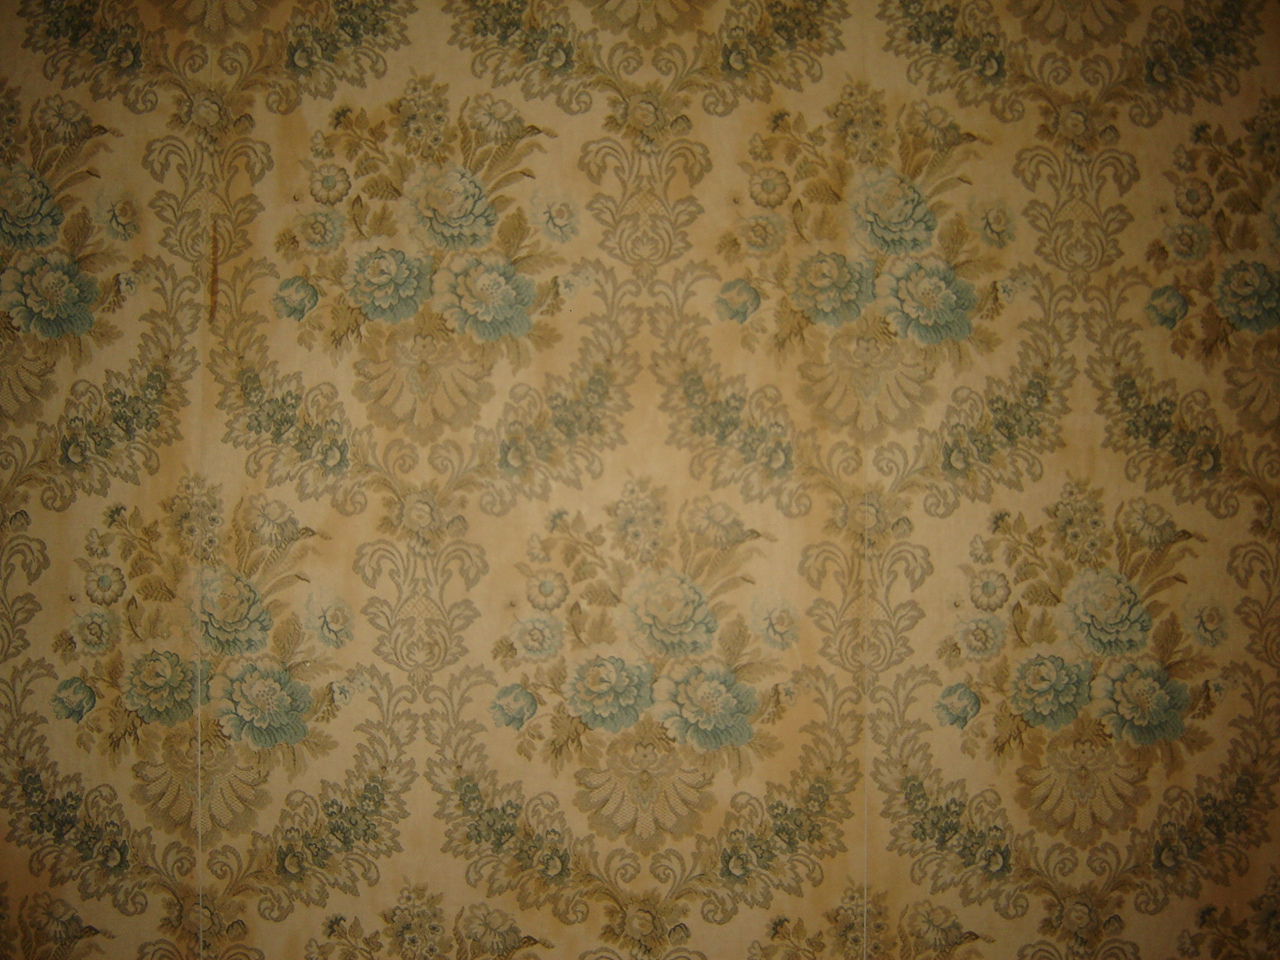 vintage desktop wallpapers vintage wallpapers vintage wallpaper 1280x960